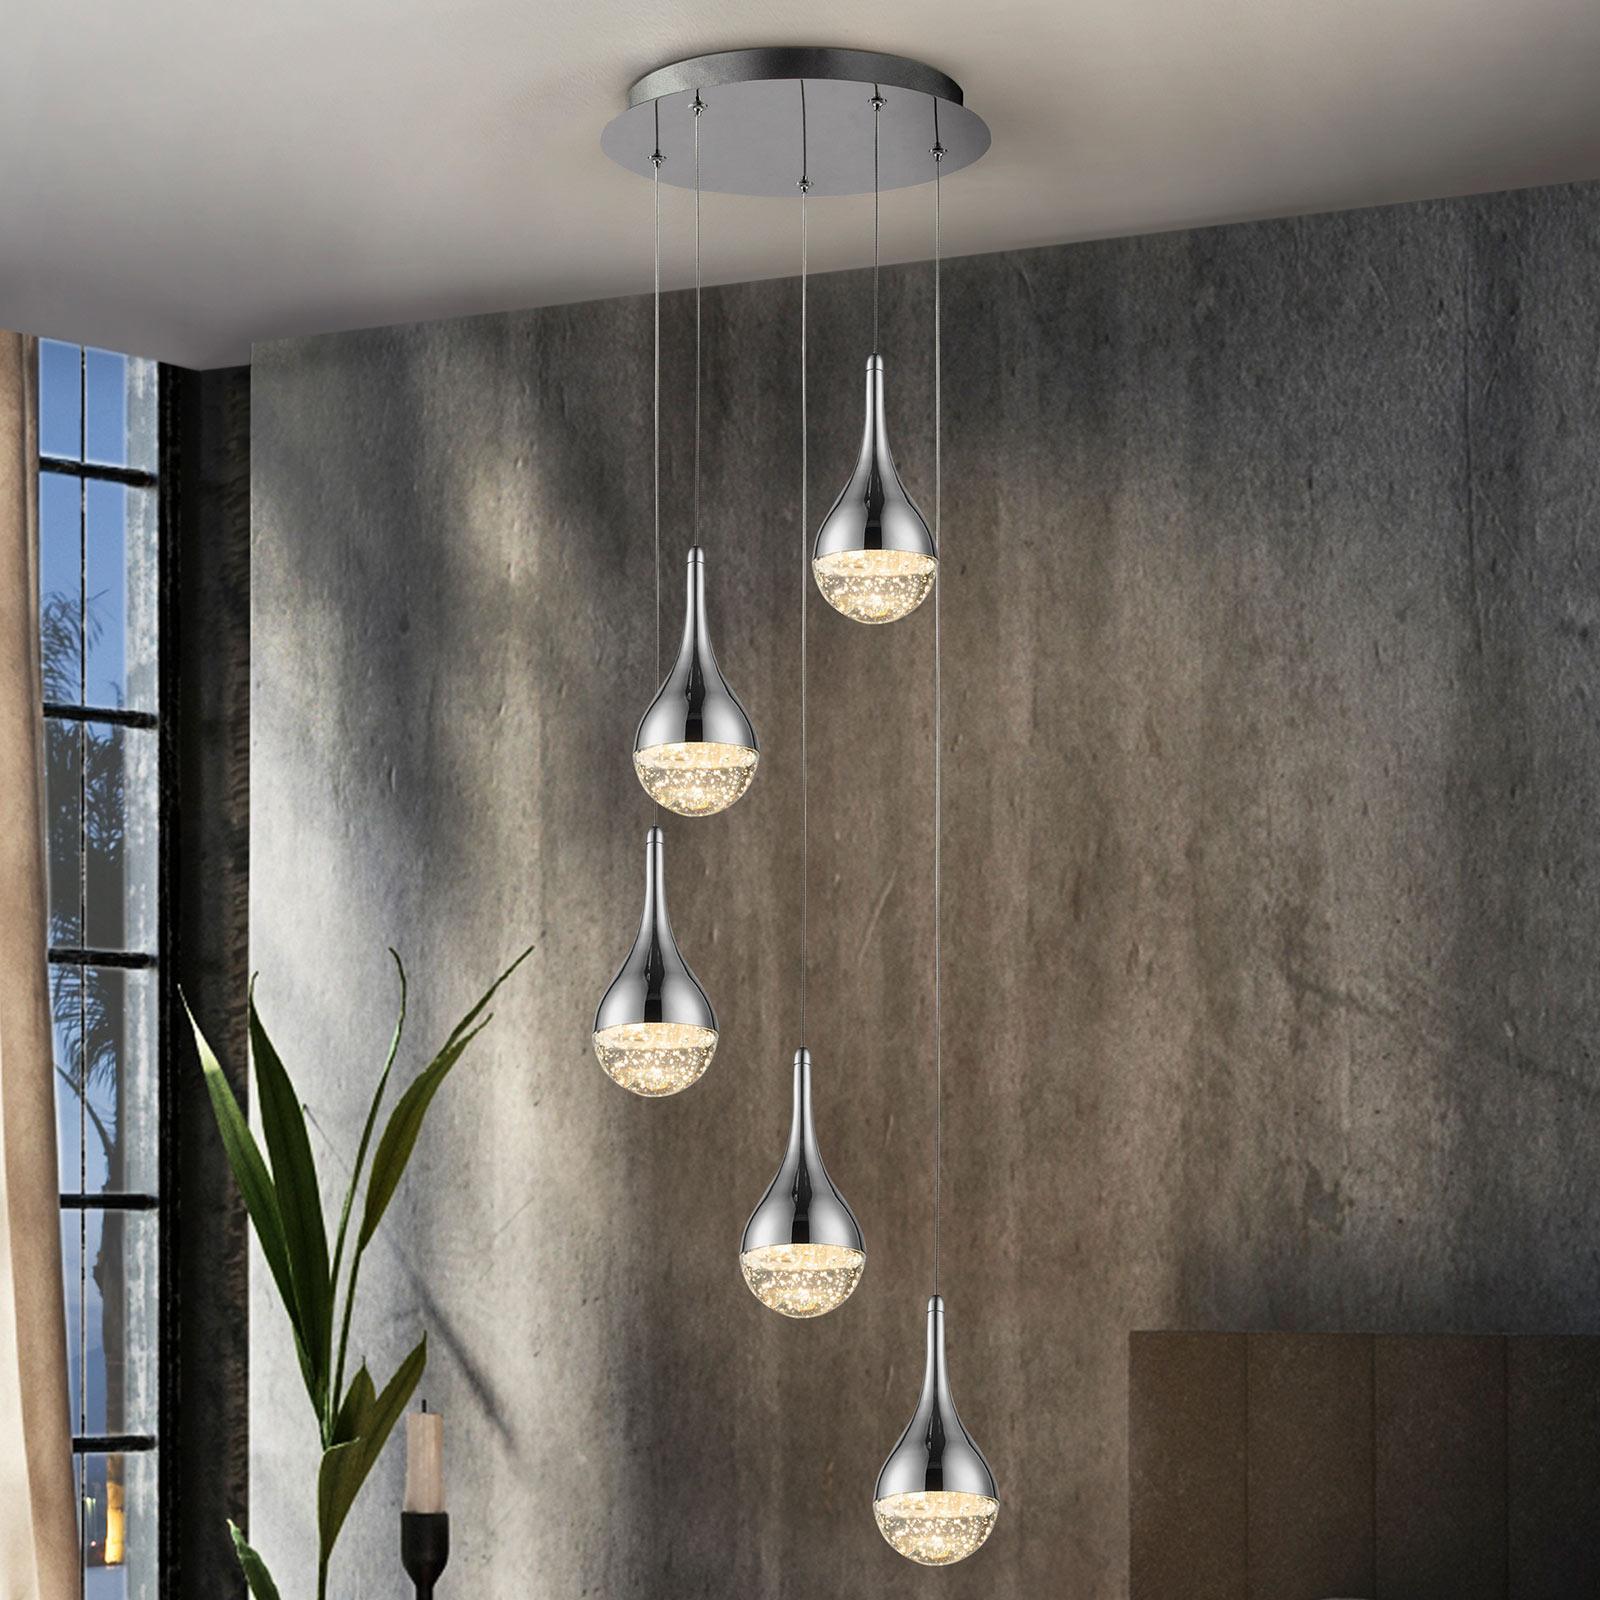 LED hanglamp Elie, 5-lamps